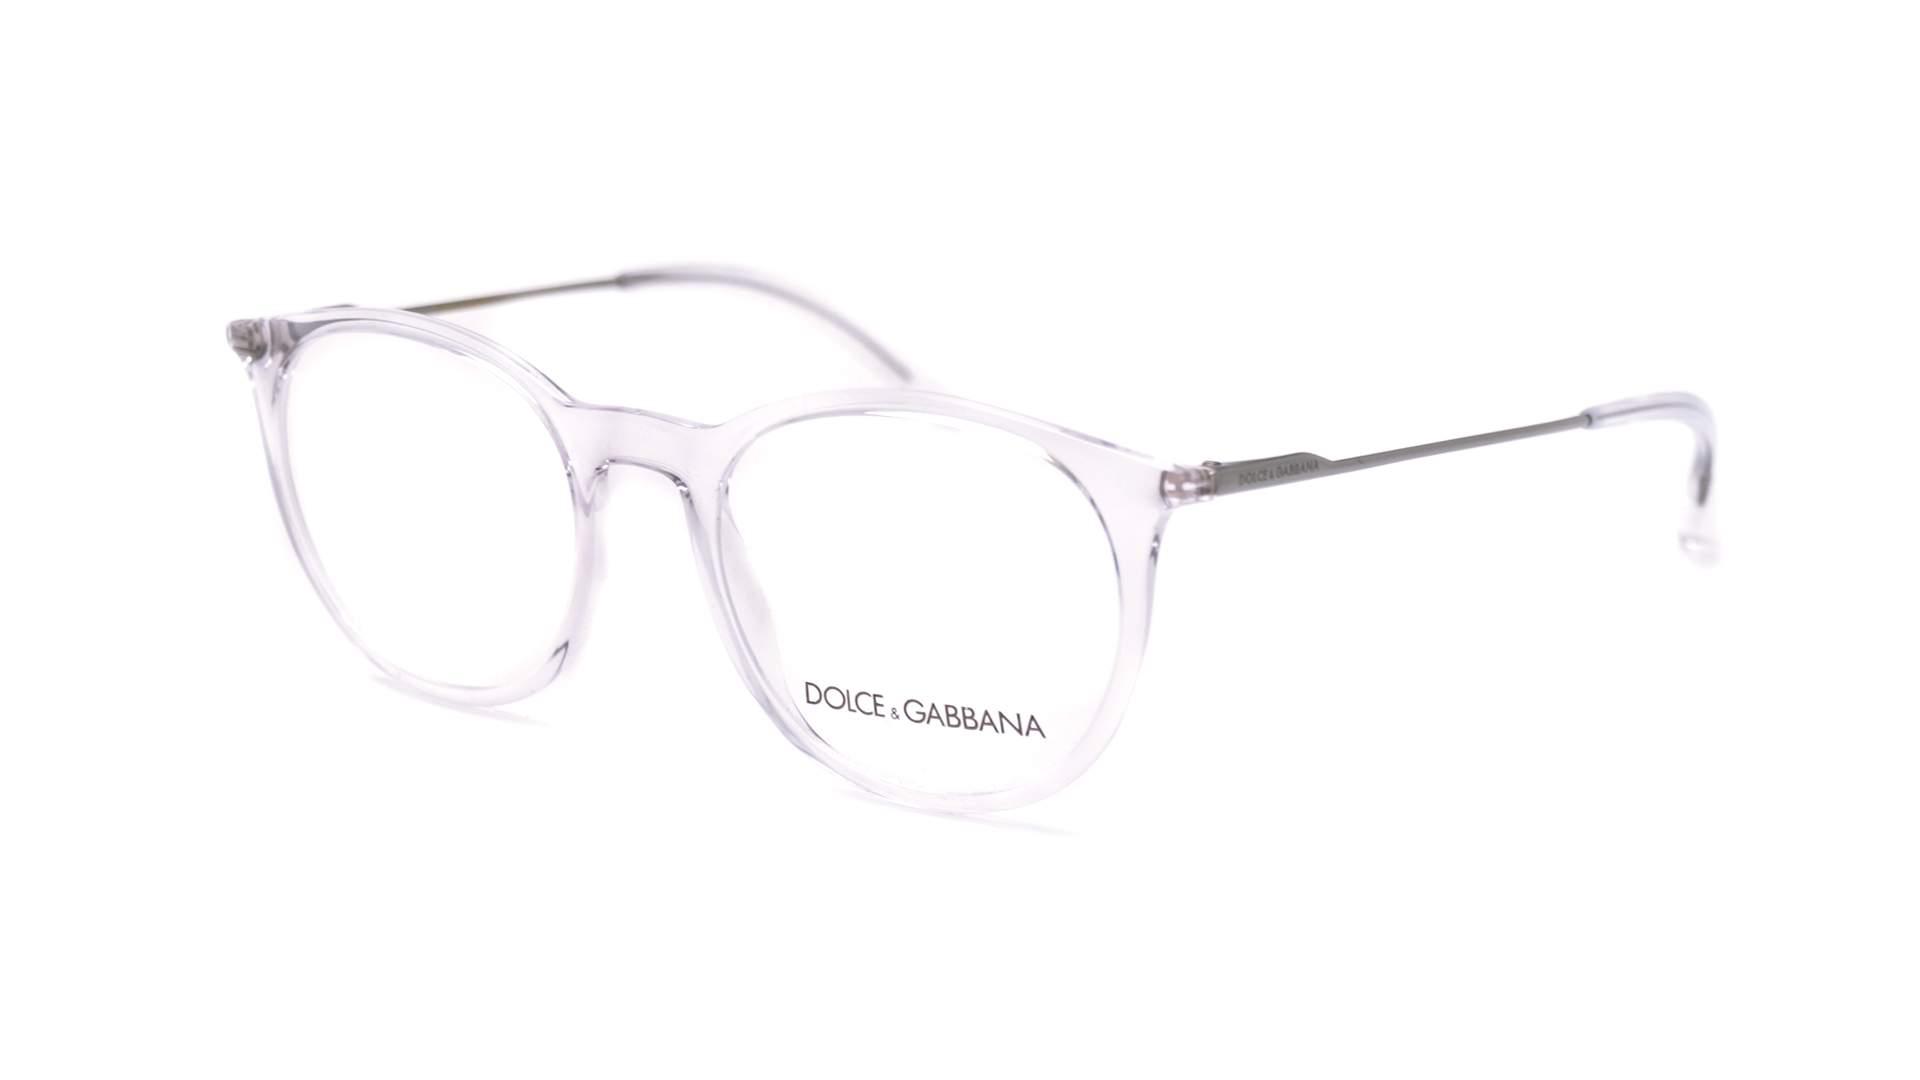 b58e5a3ad40 Eyeglasses Dolce   Gabbana DG5031 3133 49-18 Clear Medium